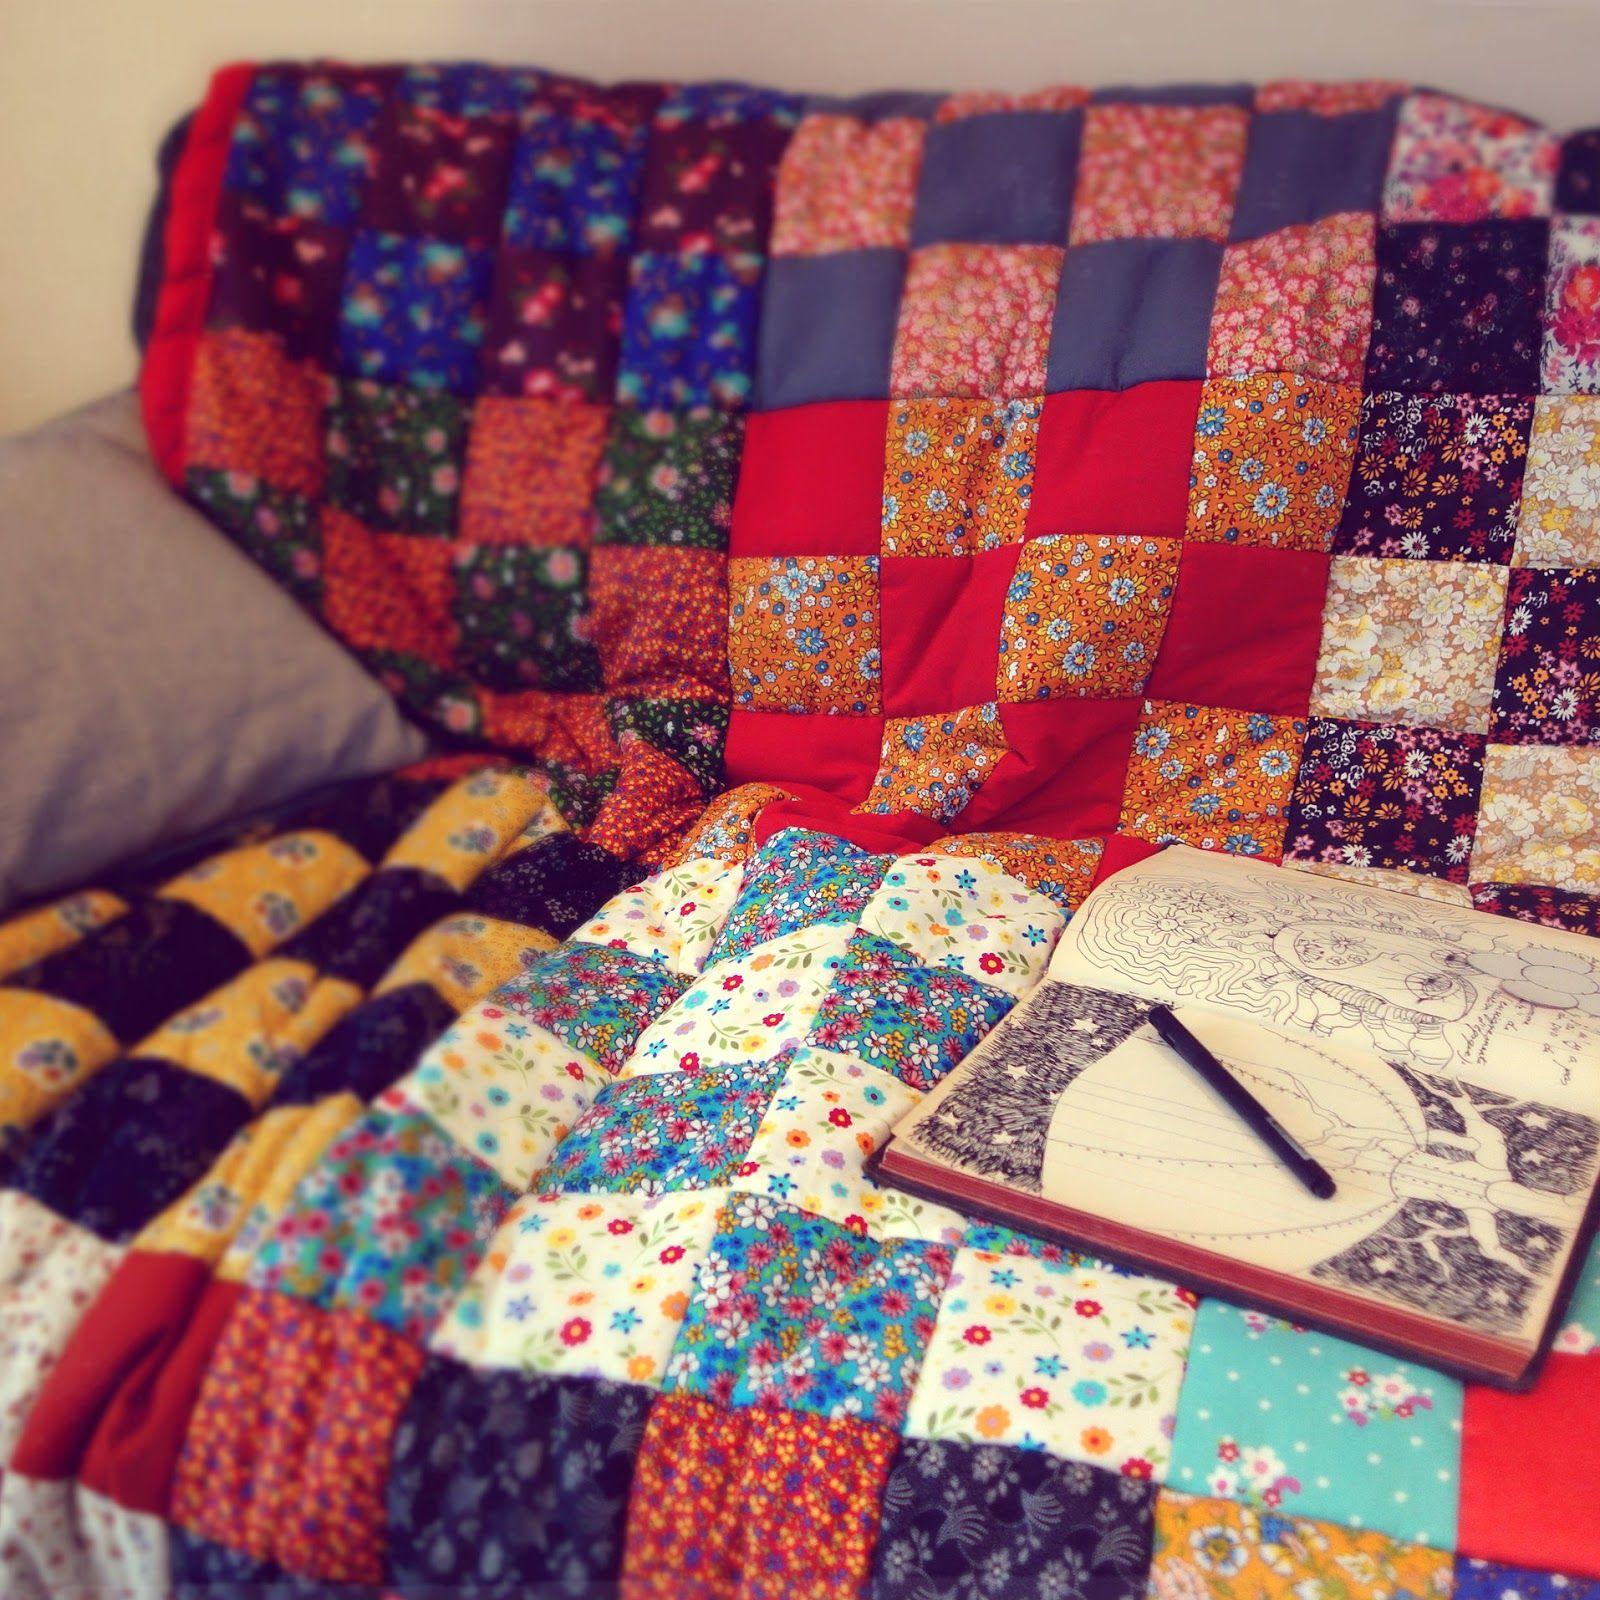 Couverture en patchwork | Madame Capucine | Couverture patchwork, Couverture, Patchwork